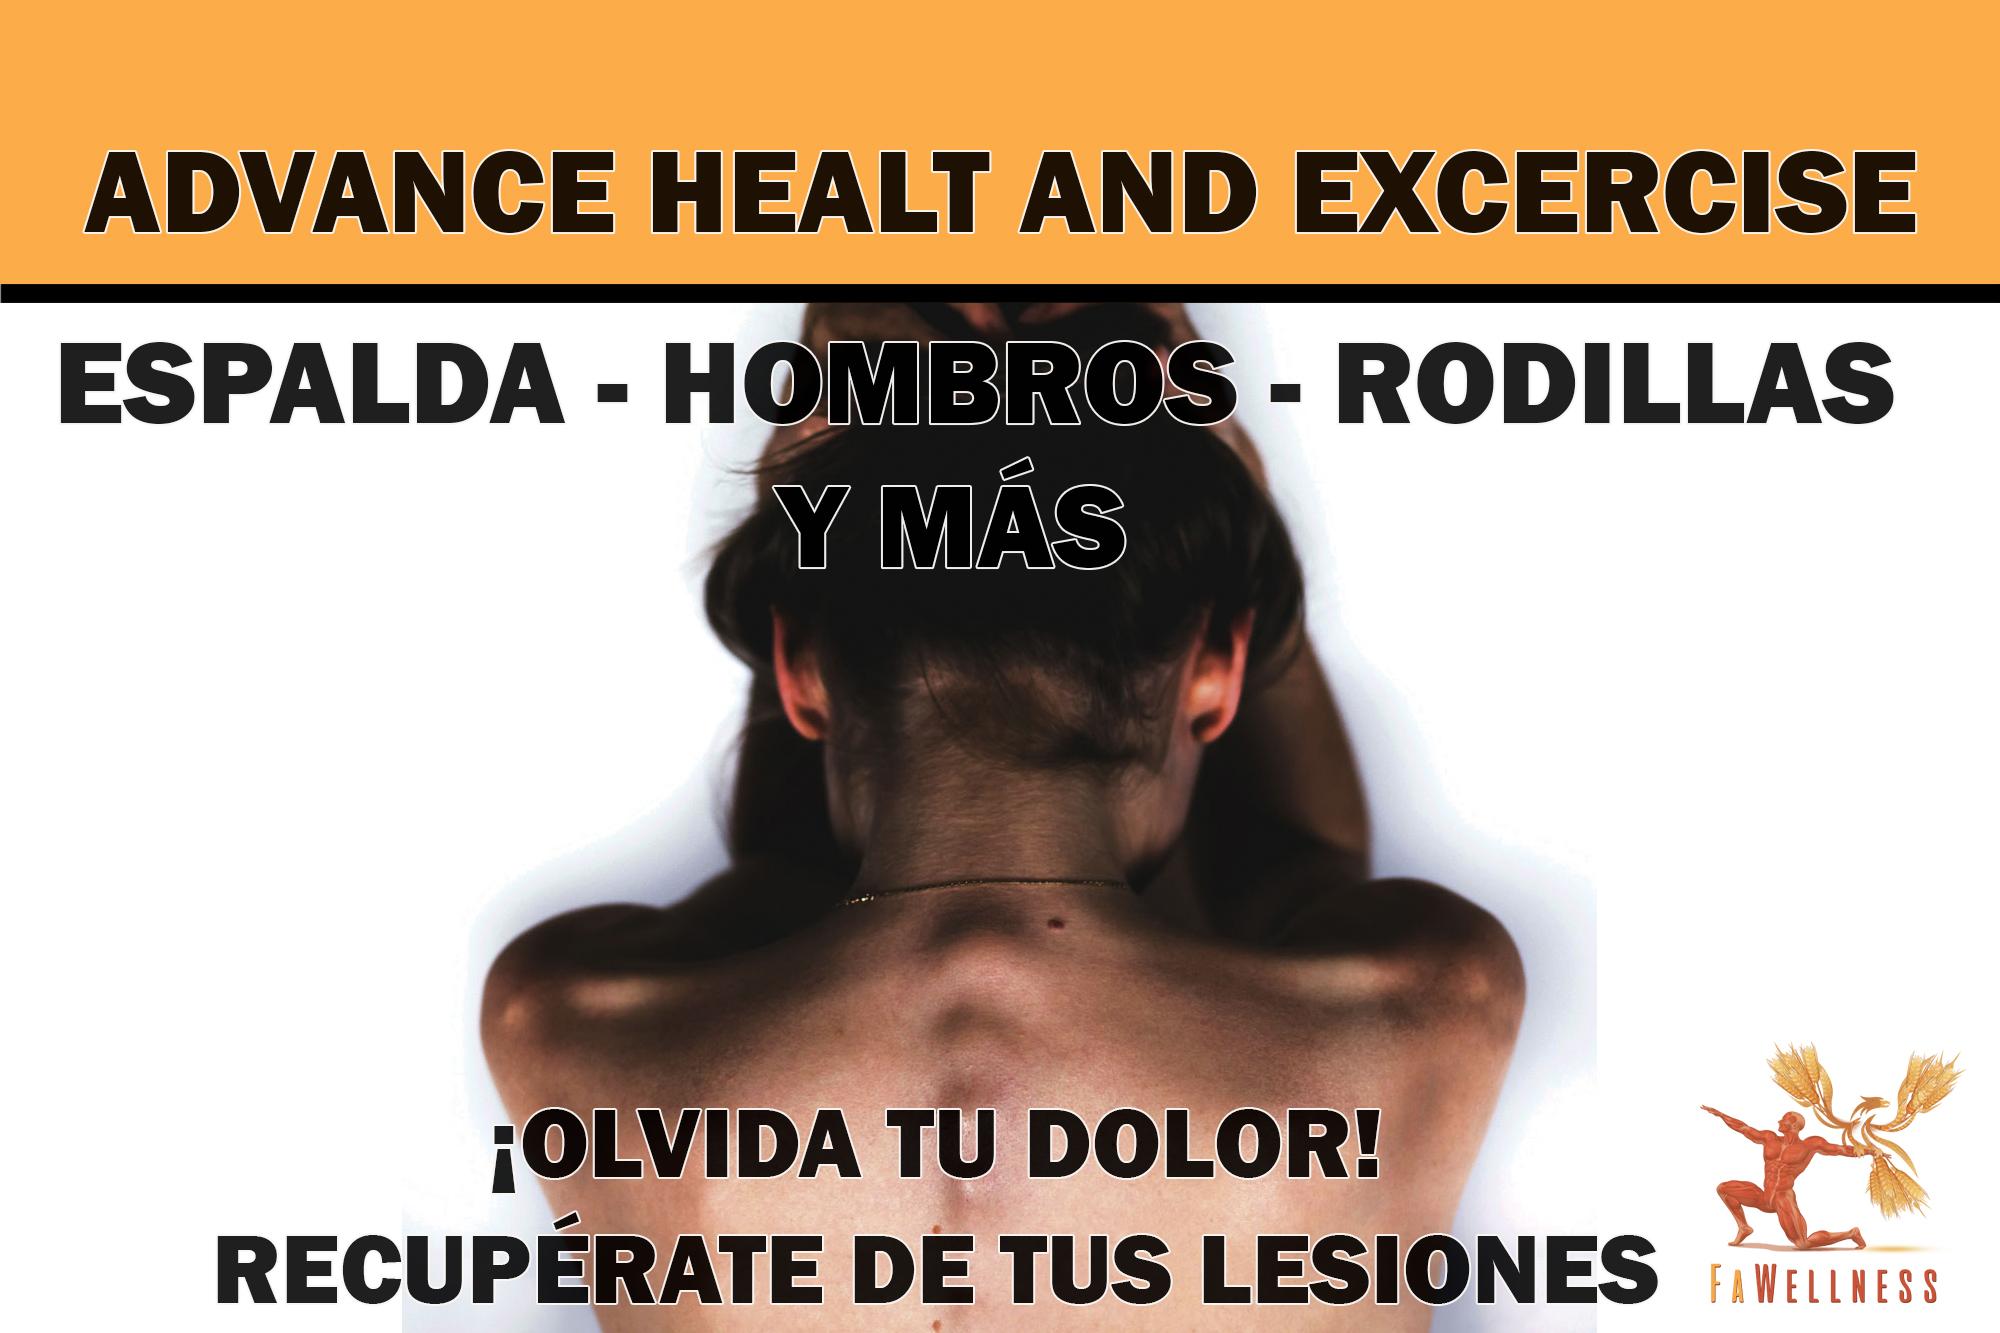 imagen blog FaWellness | ADVANCE HEALTH AND EXERCISE